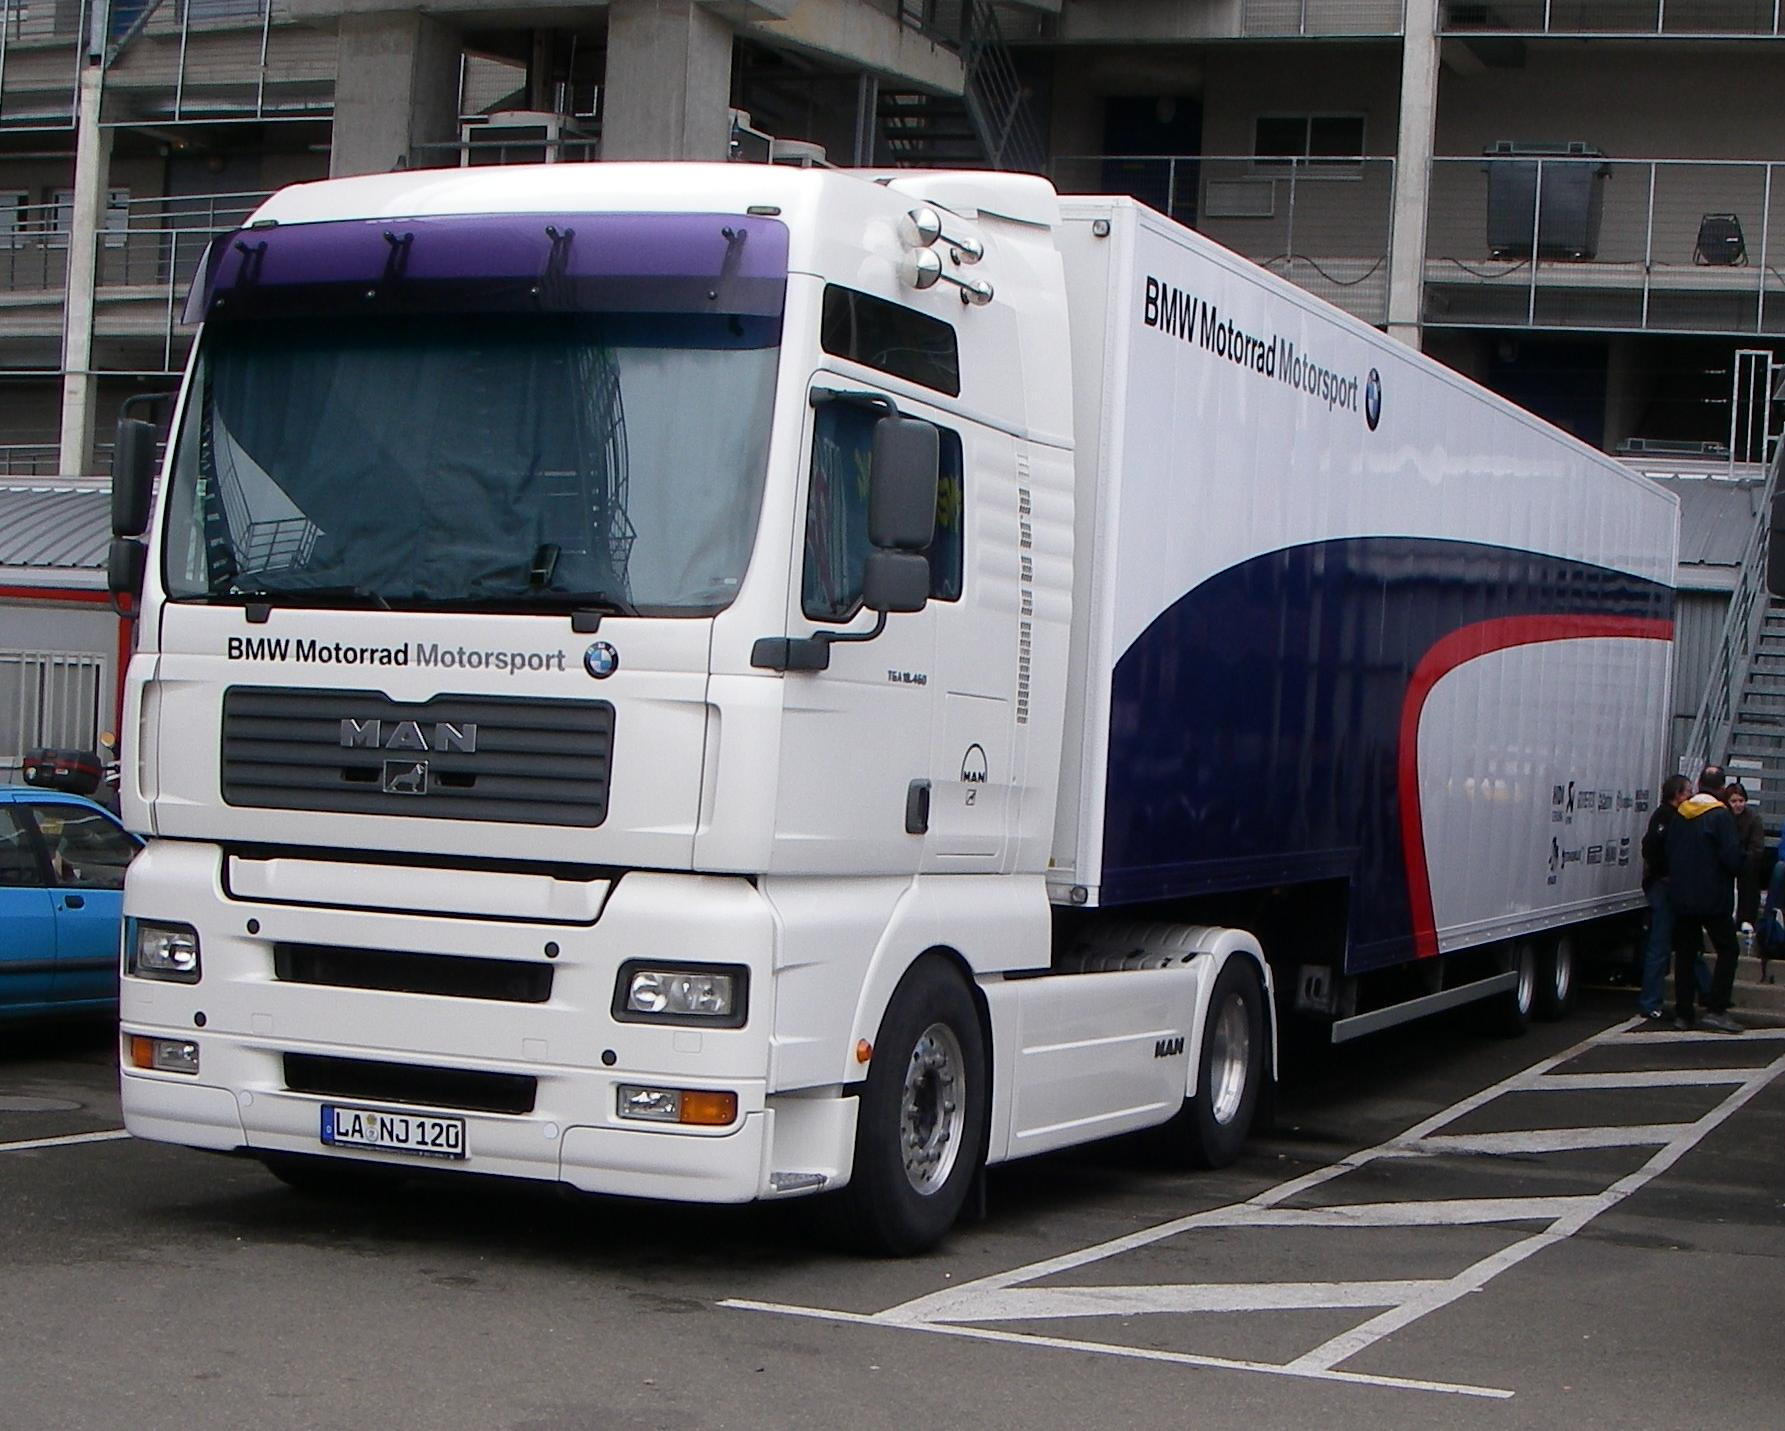 Bmw Pick Up Truck >> File:BMW Motorrad Motorsport Endurance Truck.JPG